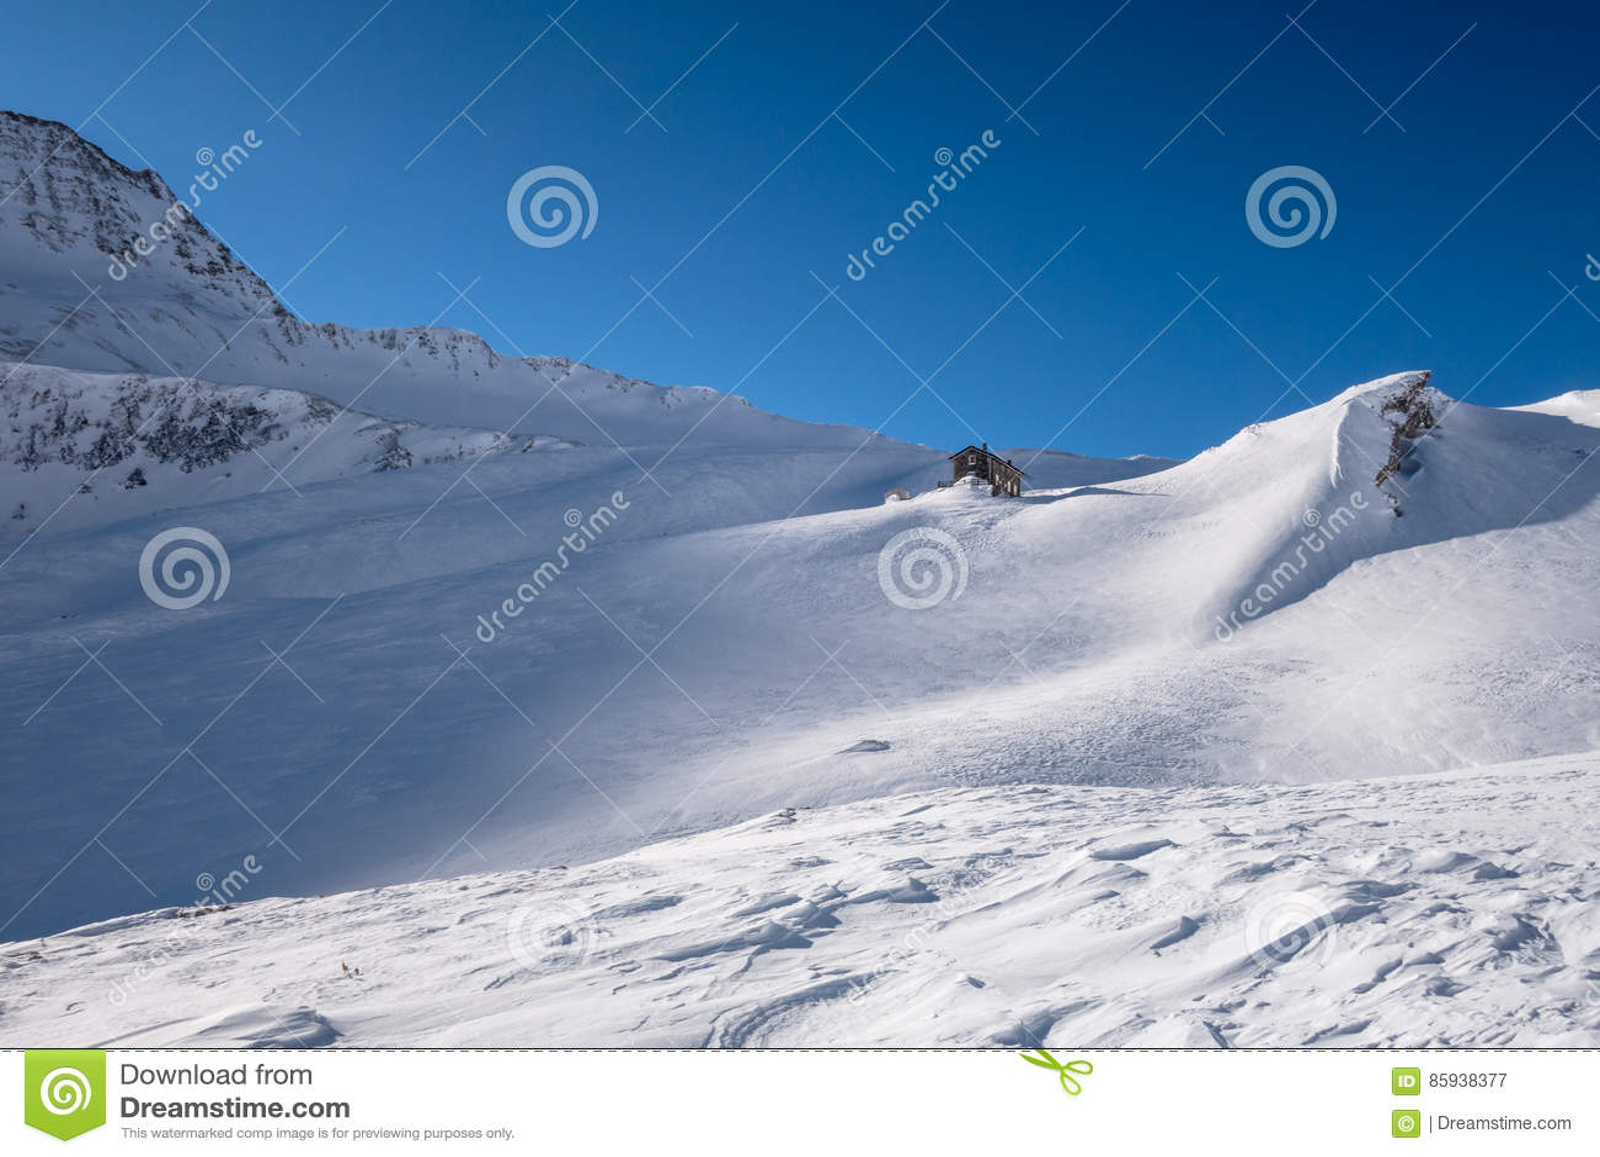 Alpine refuge below mountain ridge in winter on windswept snow